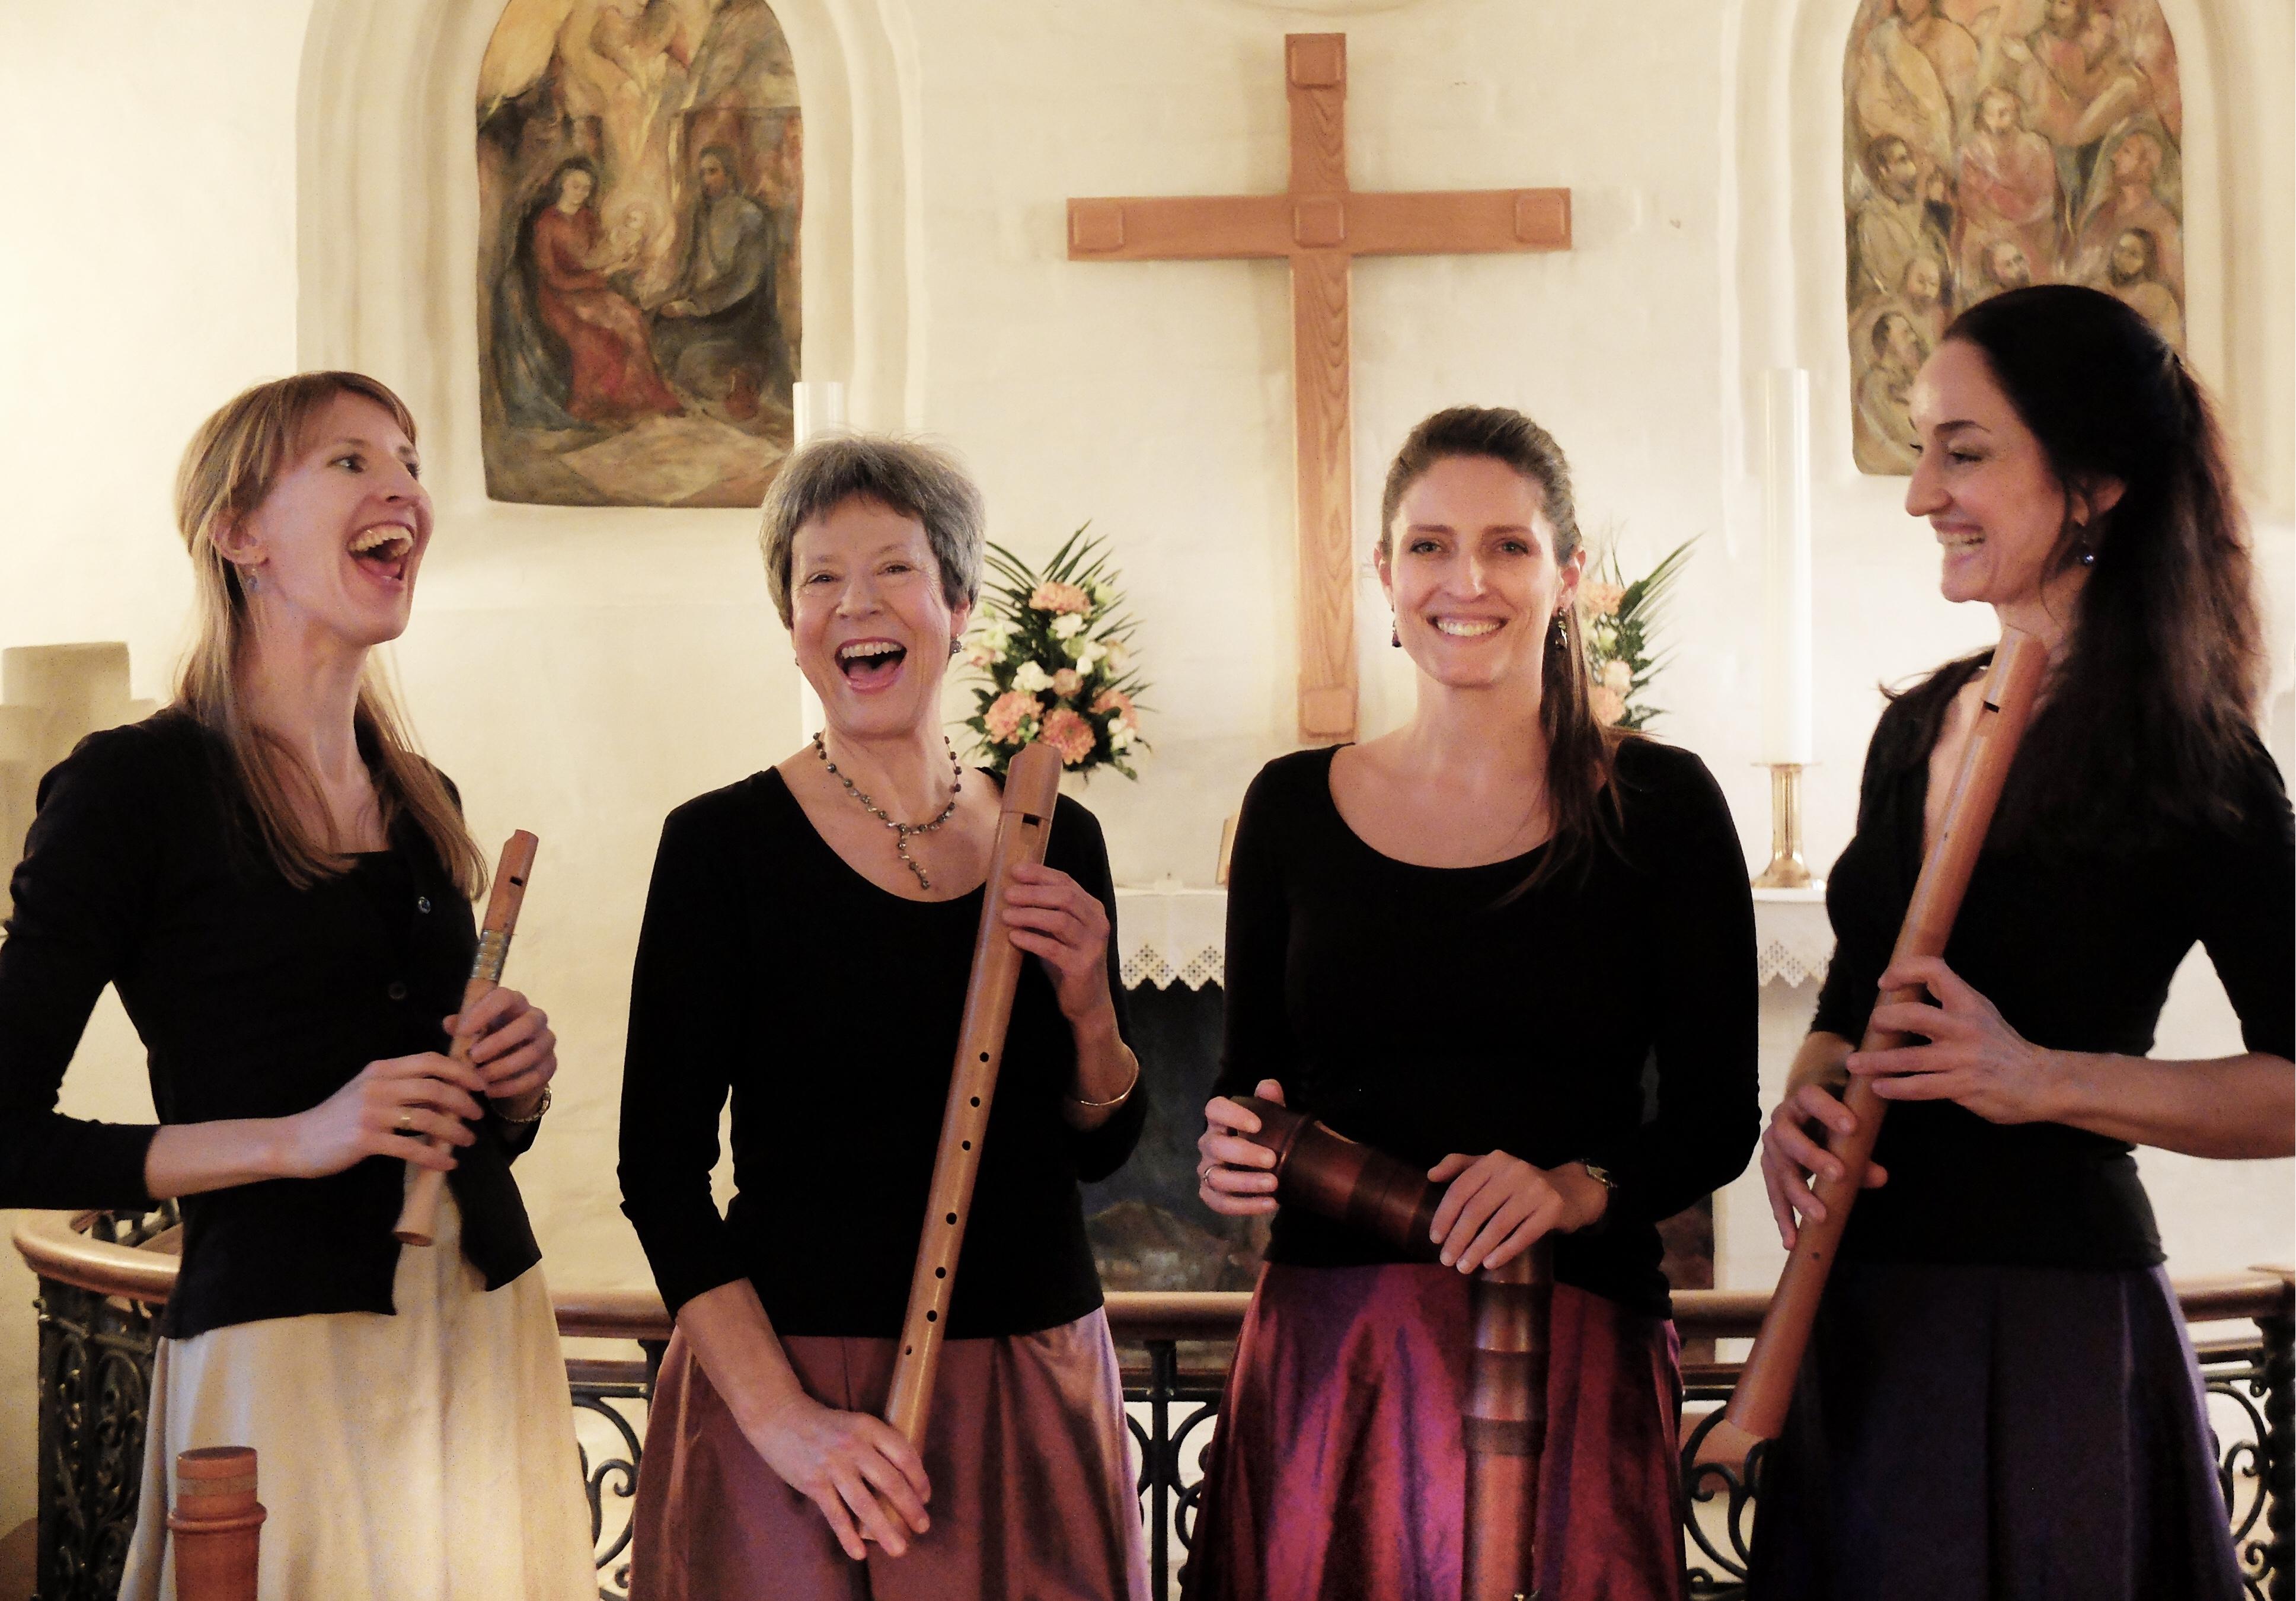 Dejlig koncert i Herlev Kirke med In Consort.